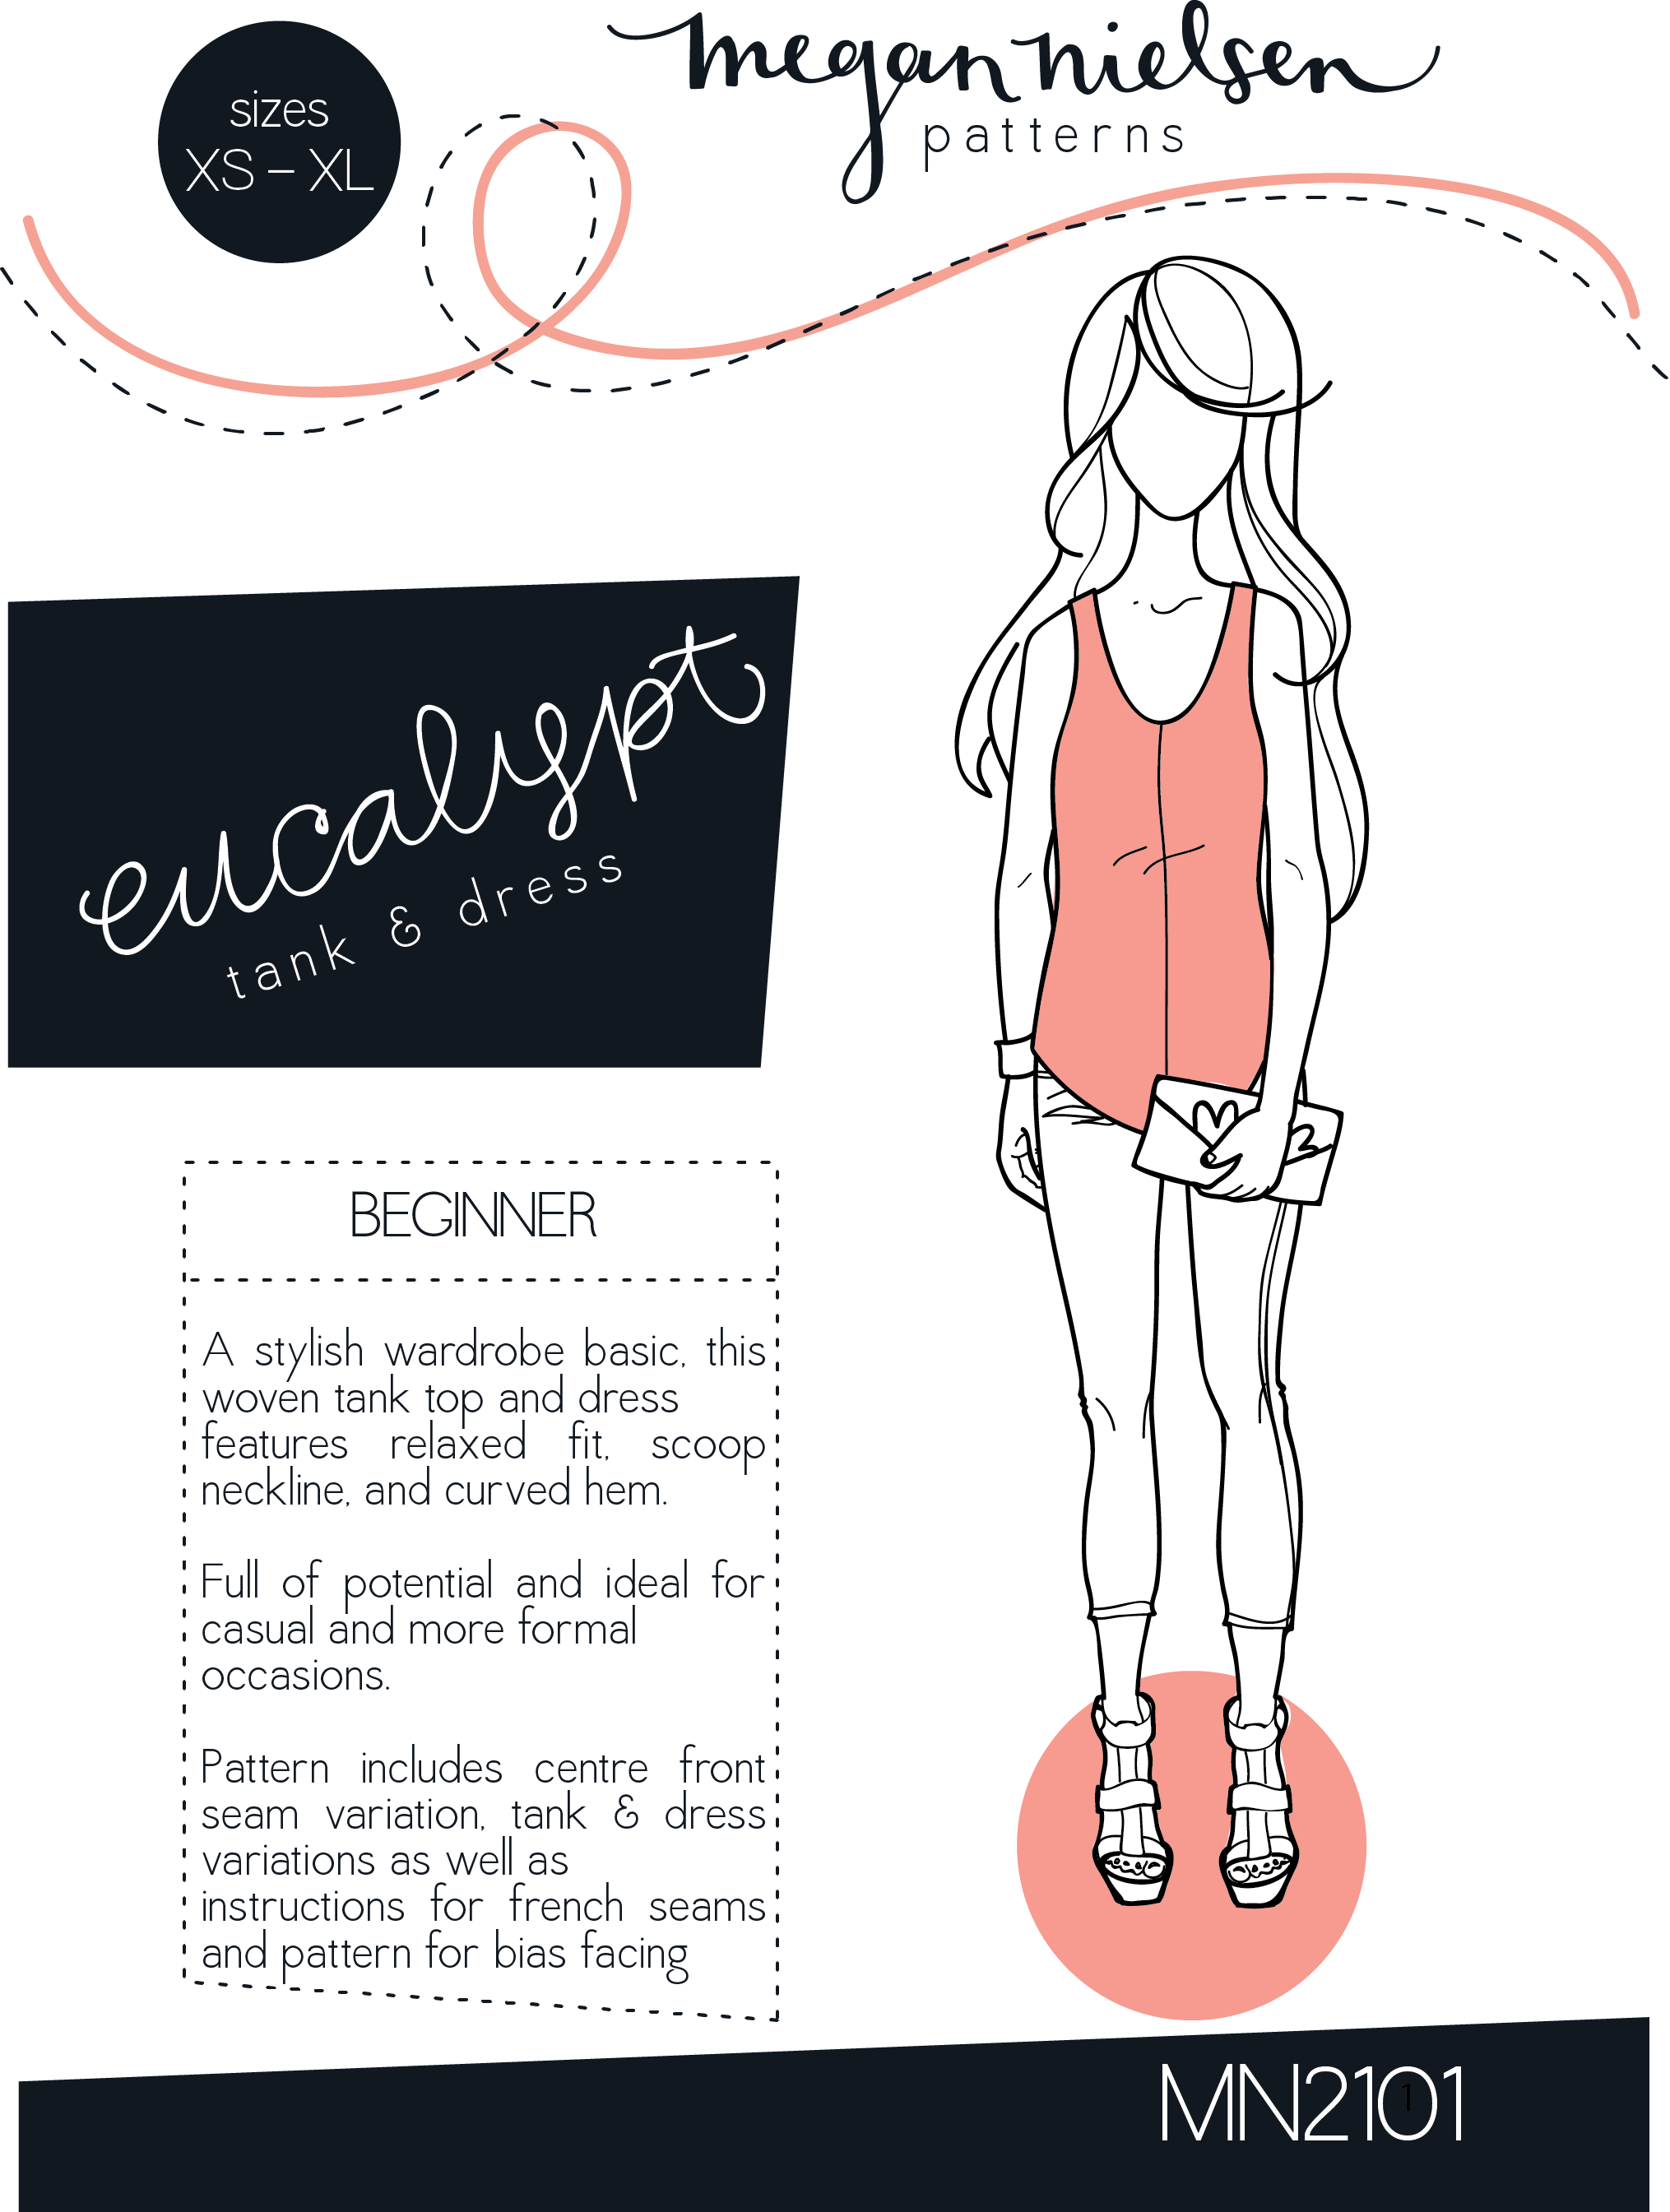 Eucalypt woven tank top & dress sewing pattern